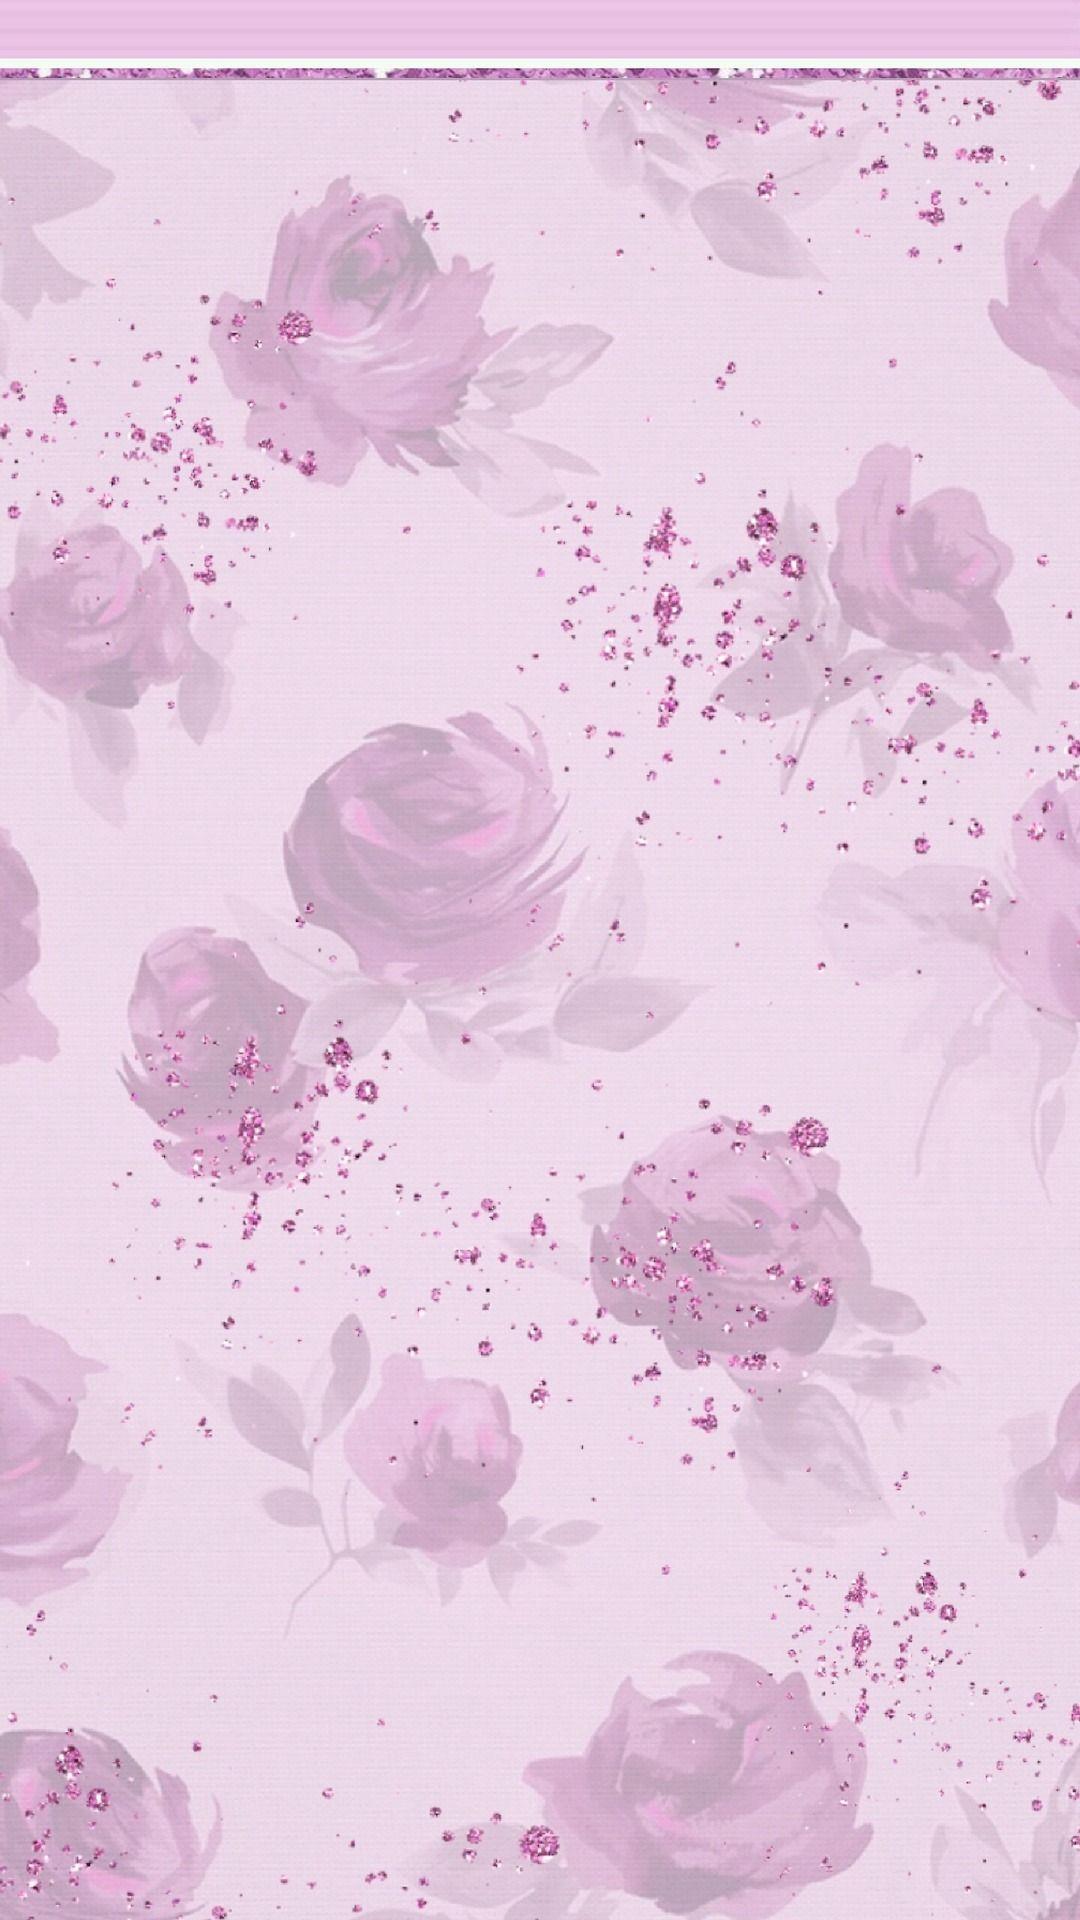 Wallpapers Sweet Purple Wallpapers Flowery Wallpaper Cute Flower Wallpapers New Flower Wallpaper